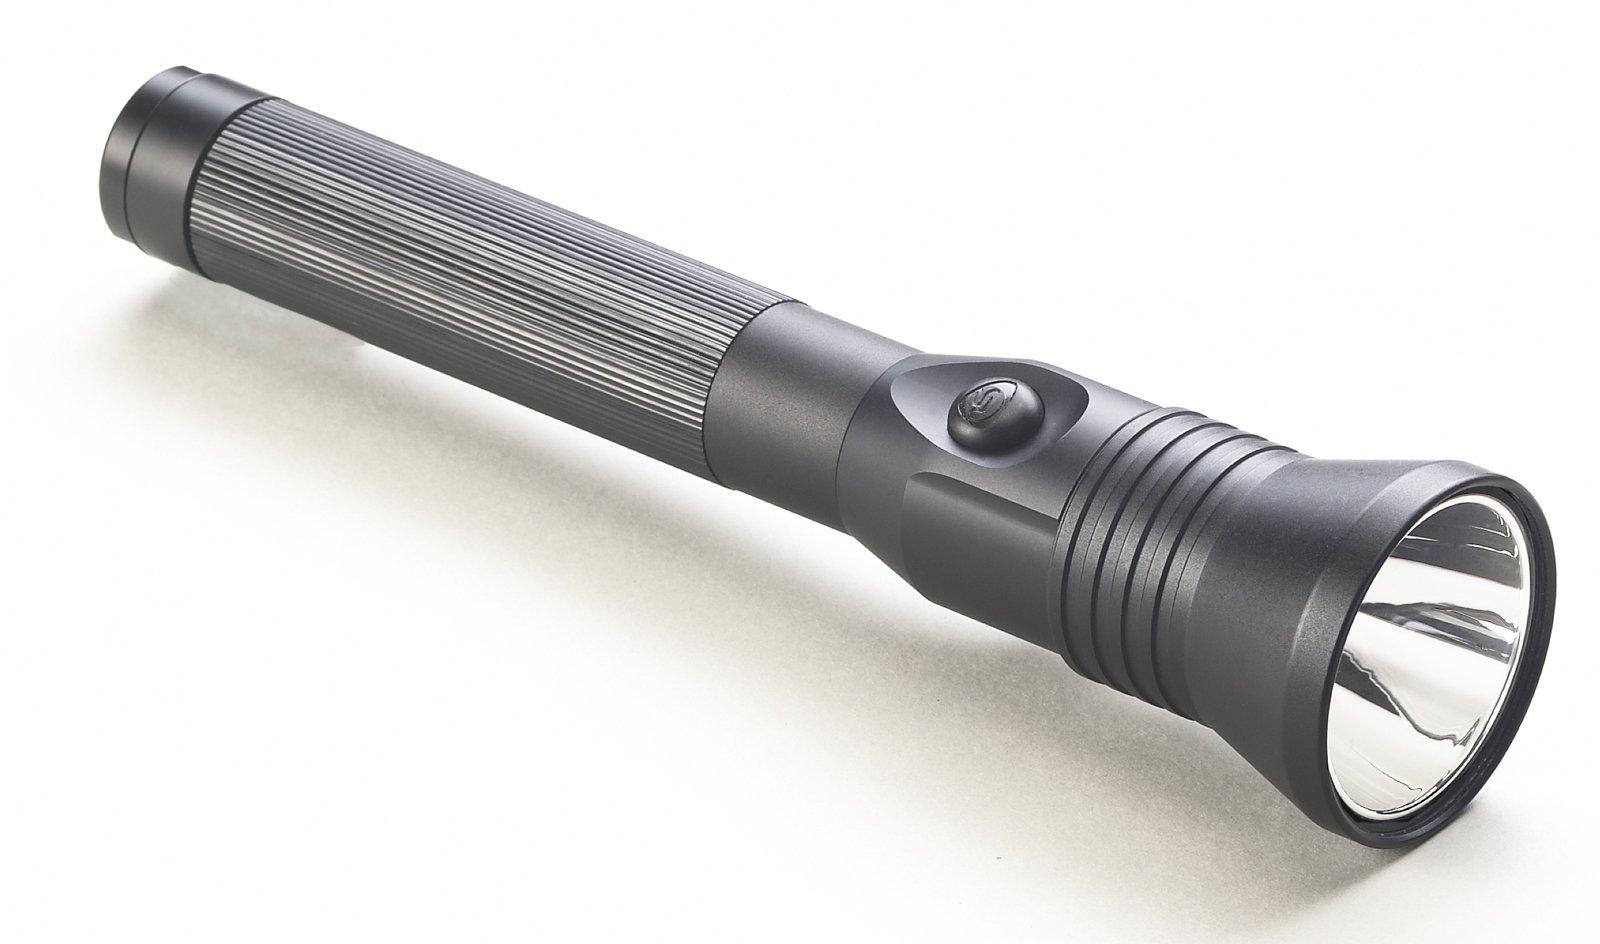 Streamlight 75882 Stinger DS C4 LED HP Rechargeable Flashlight